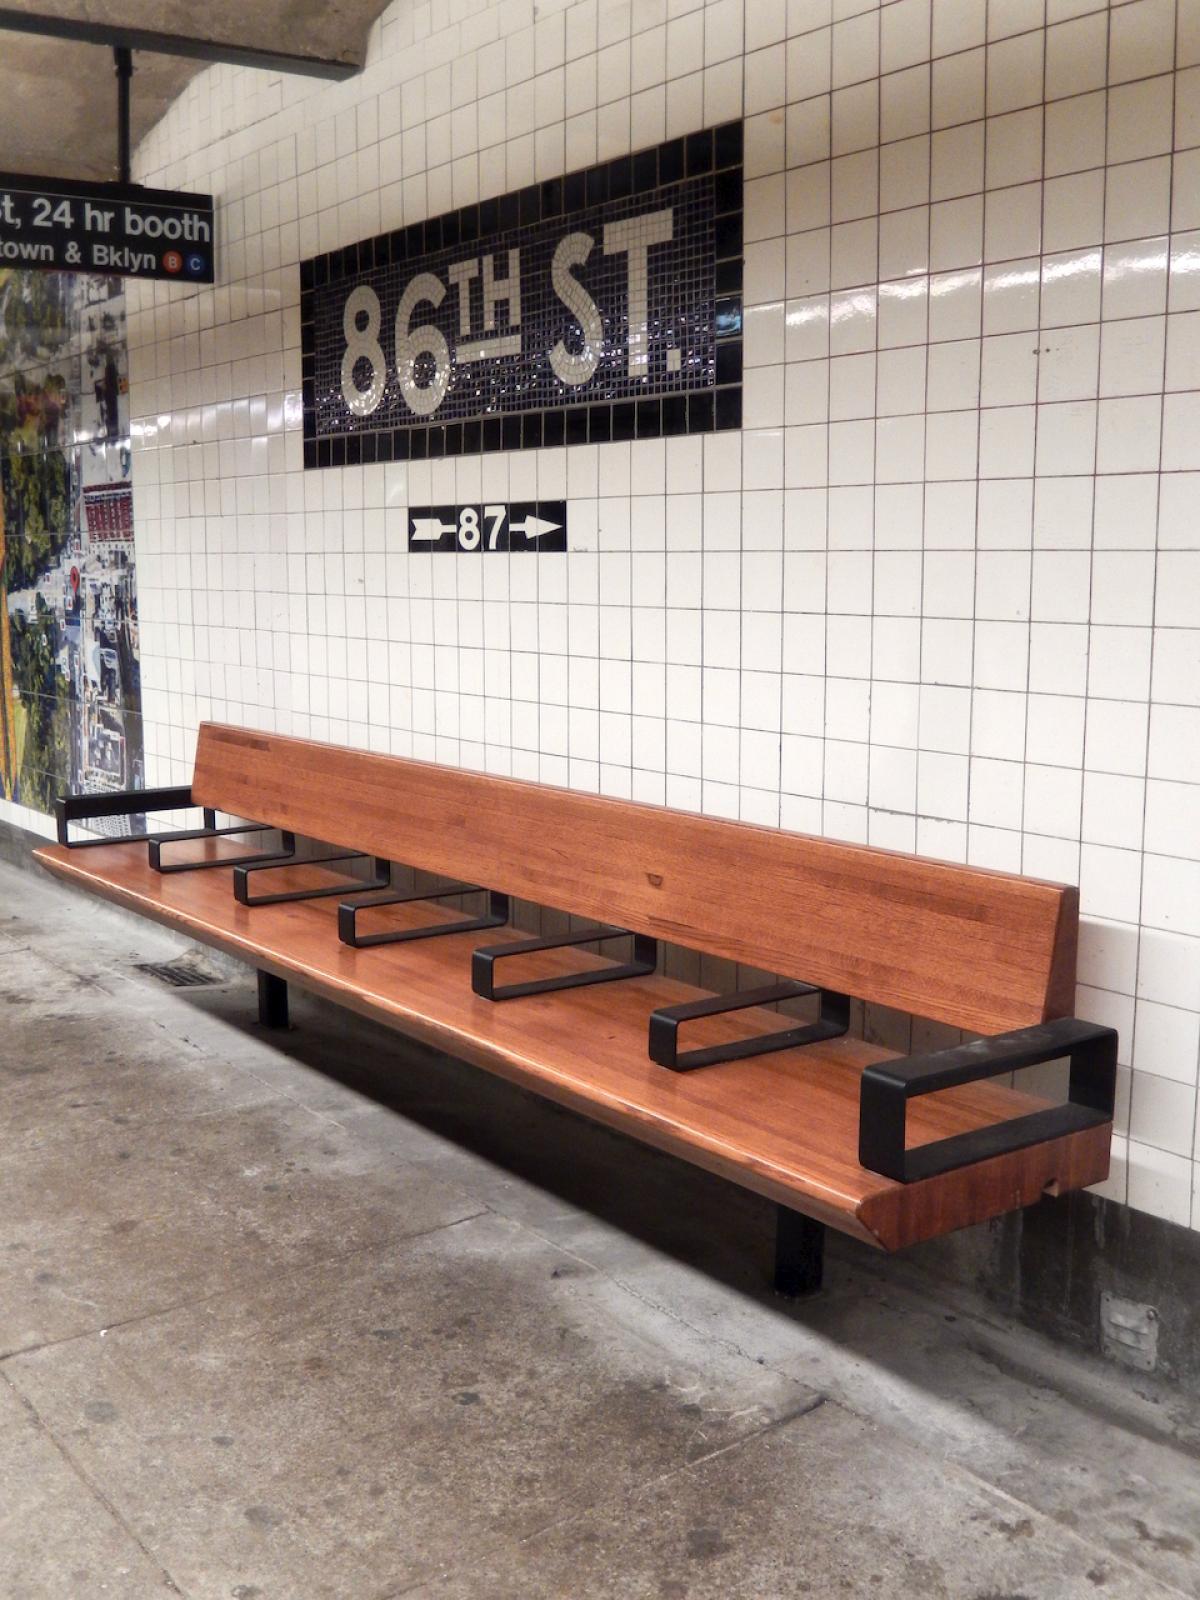 NYC Subway Benches Part 2 1